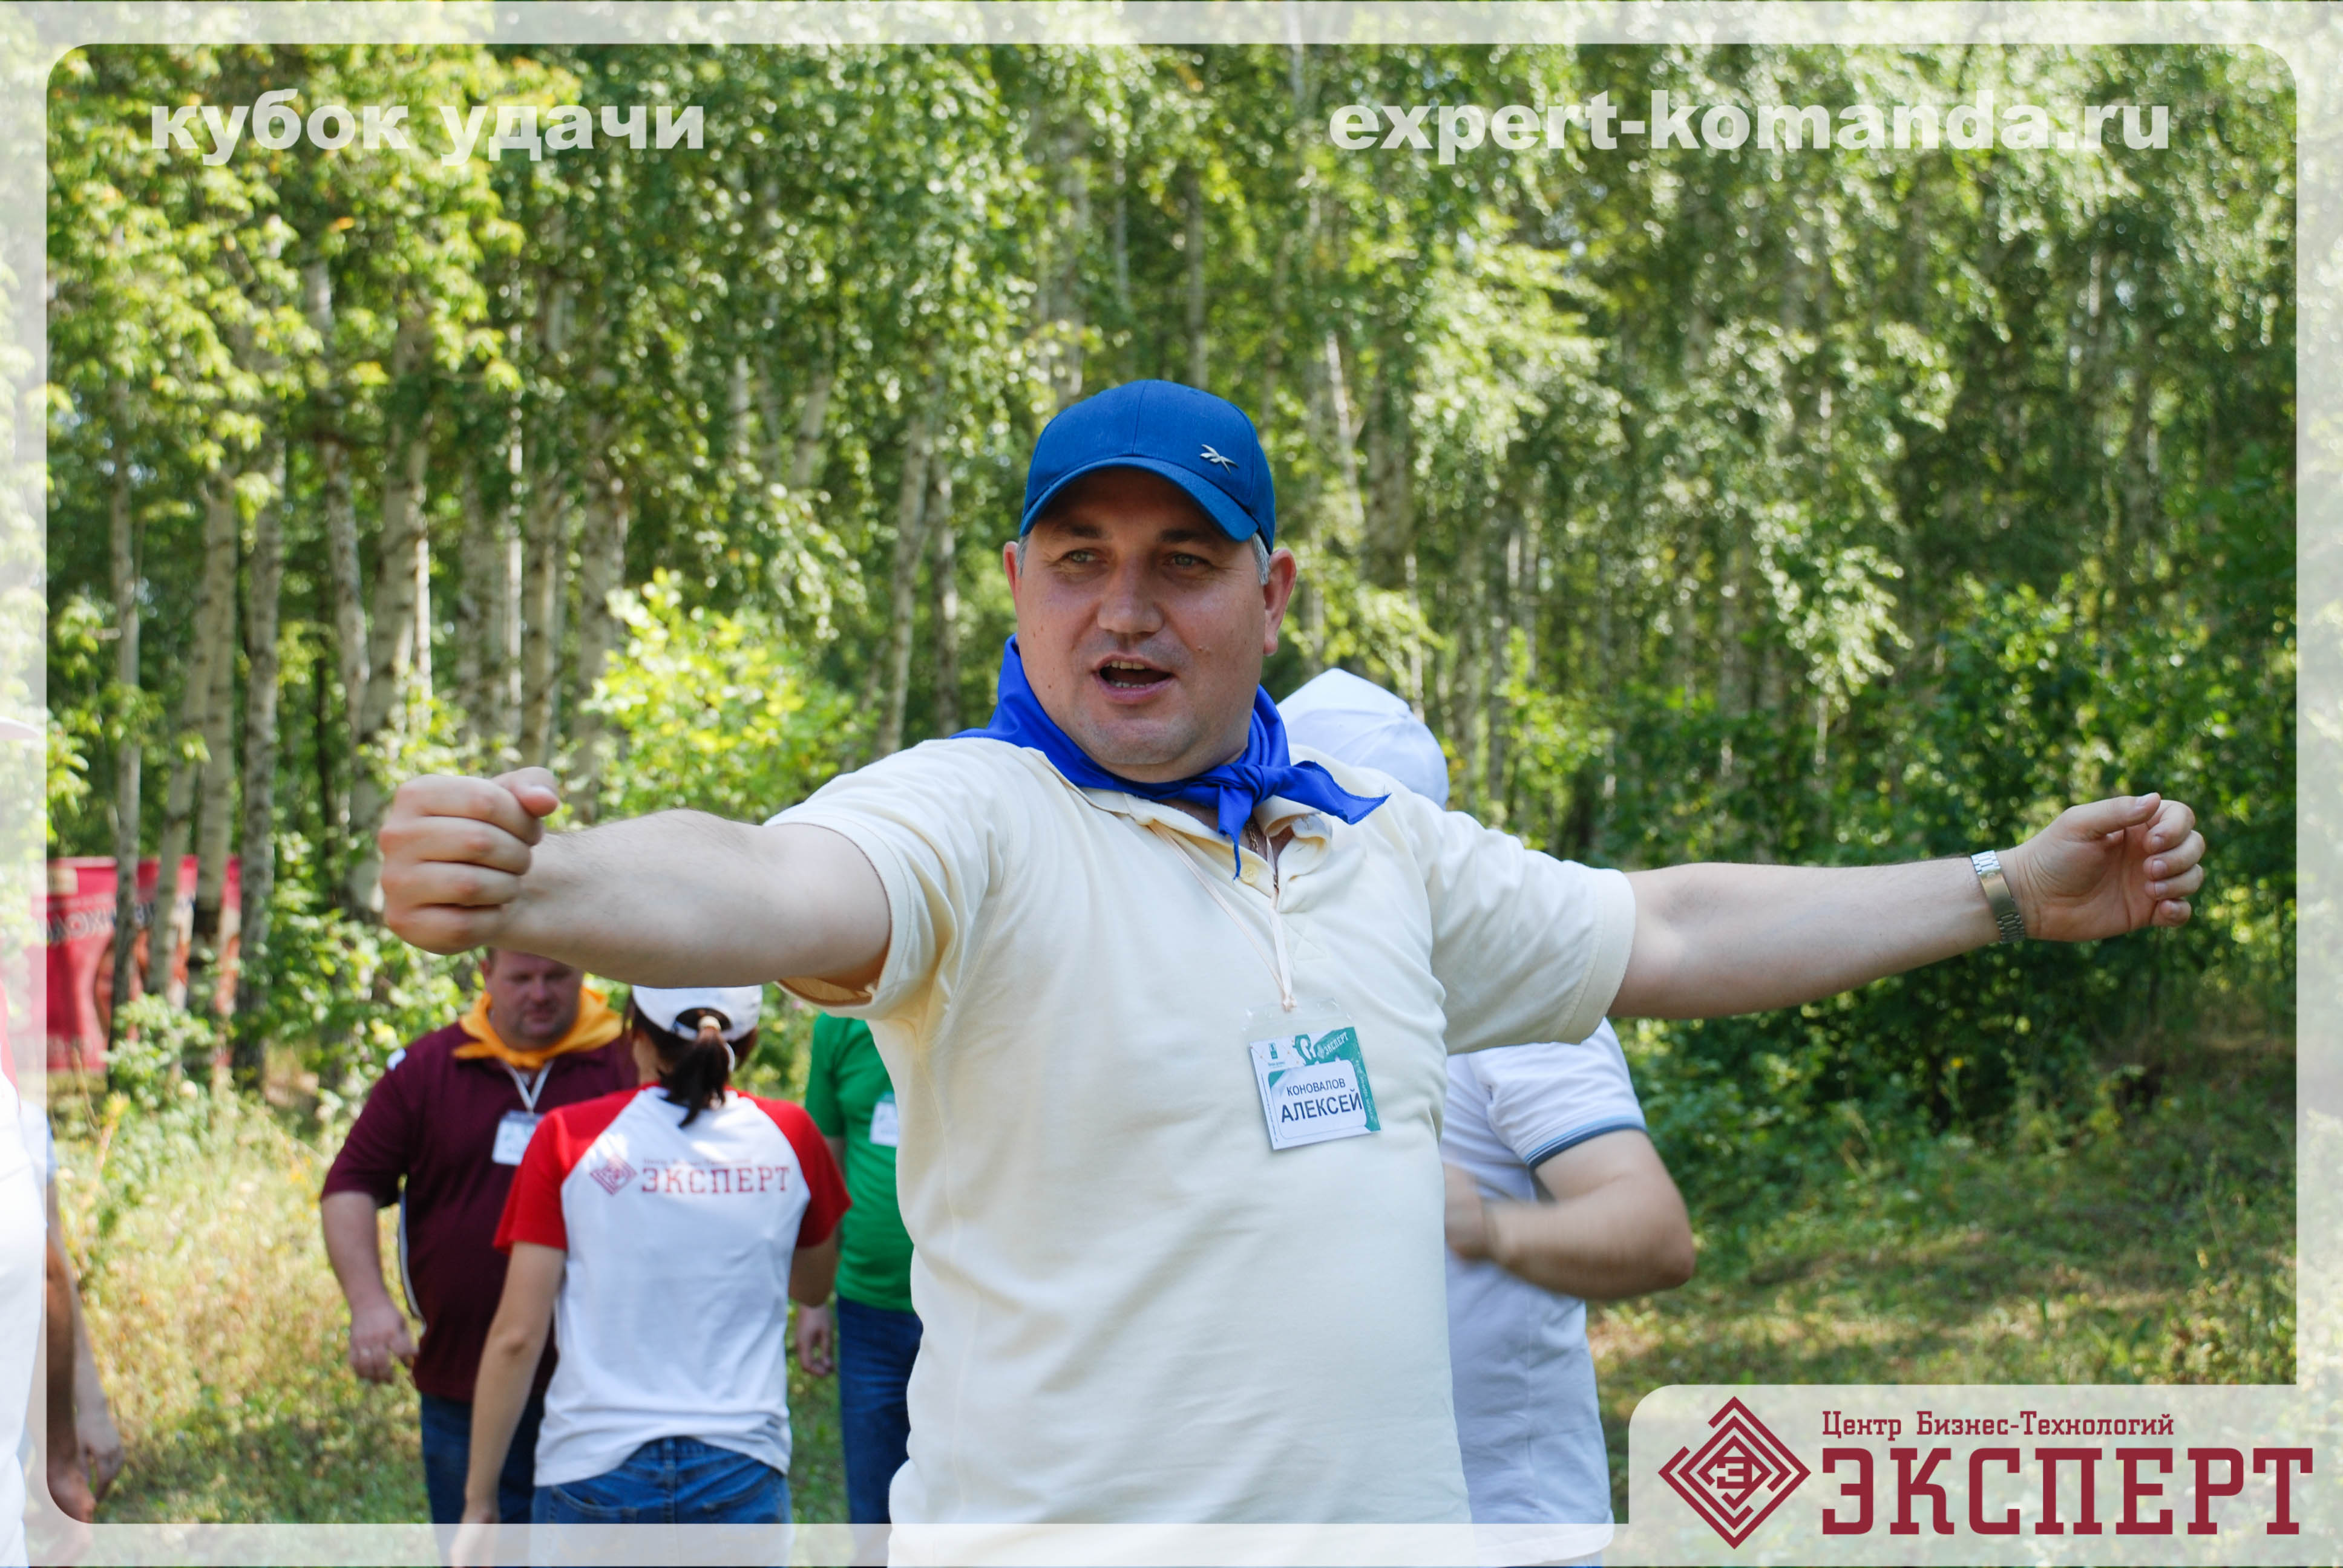 2014-08-01 тимбилдинг «Кубок удачи»